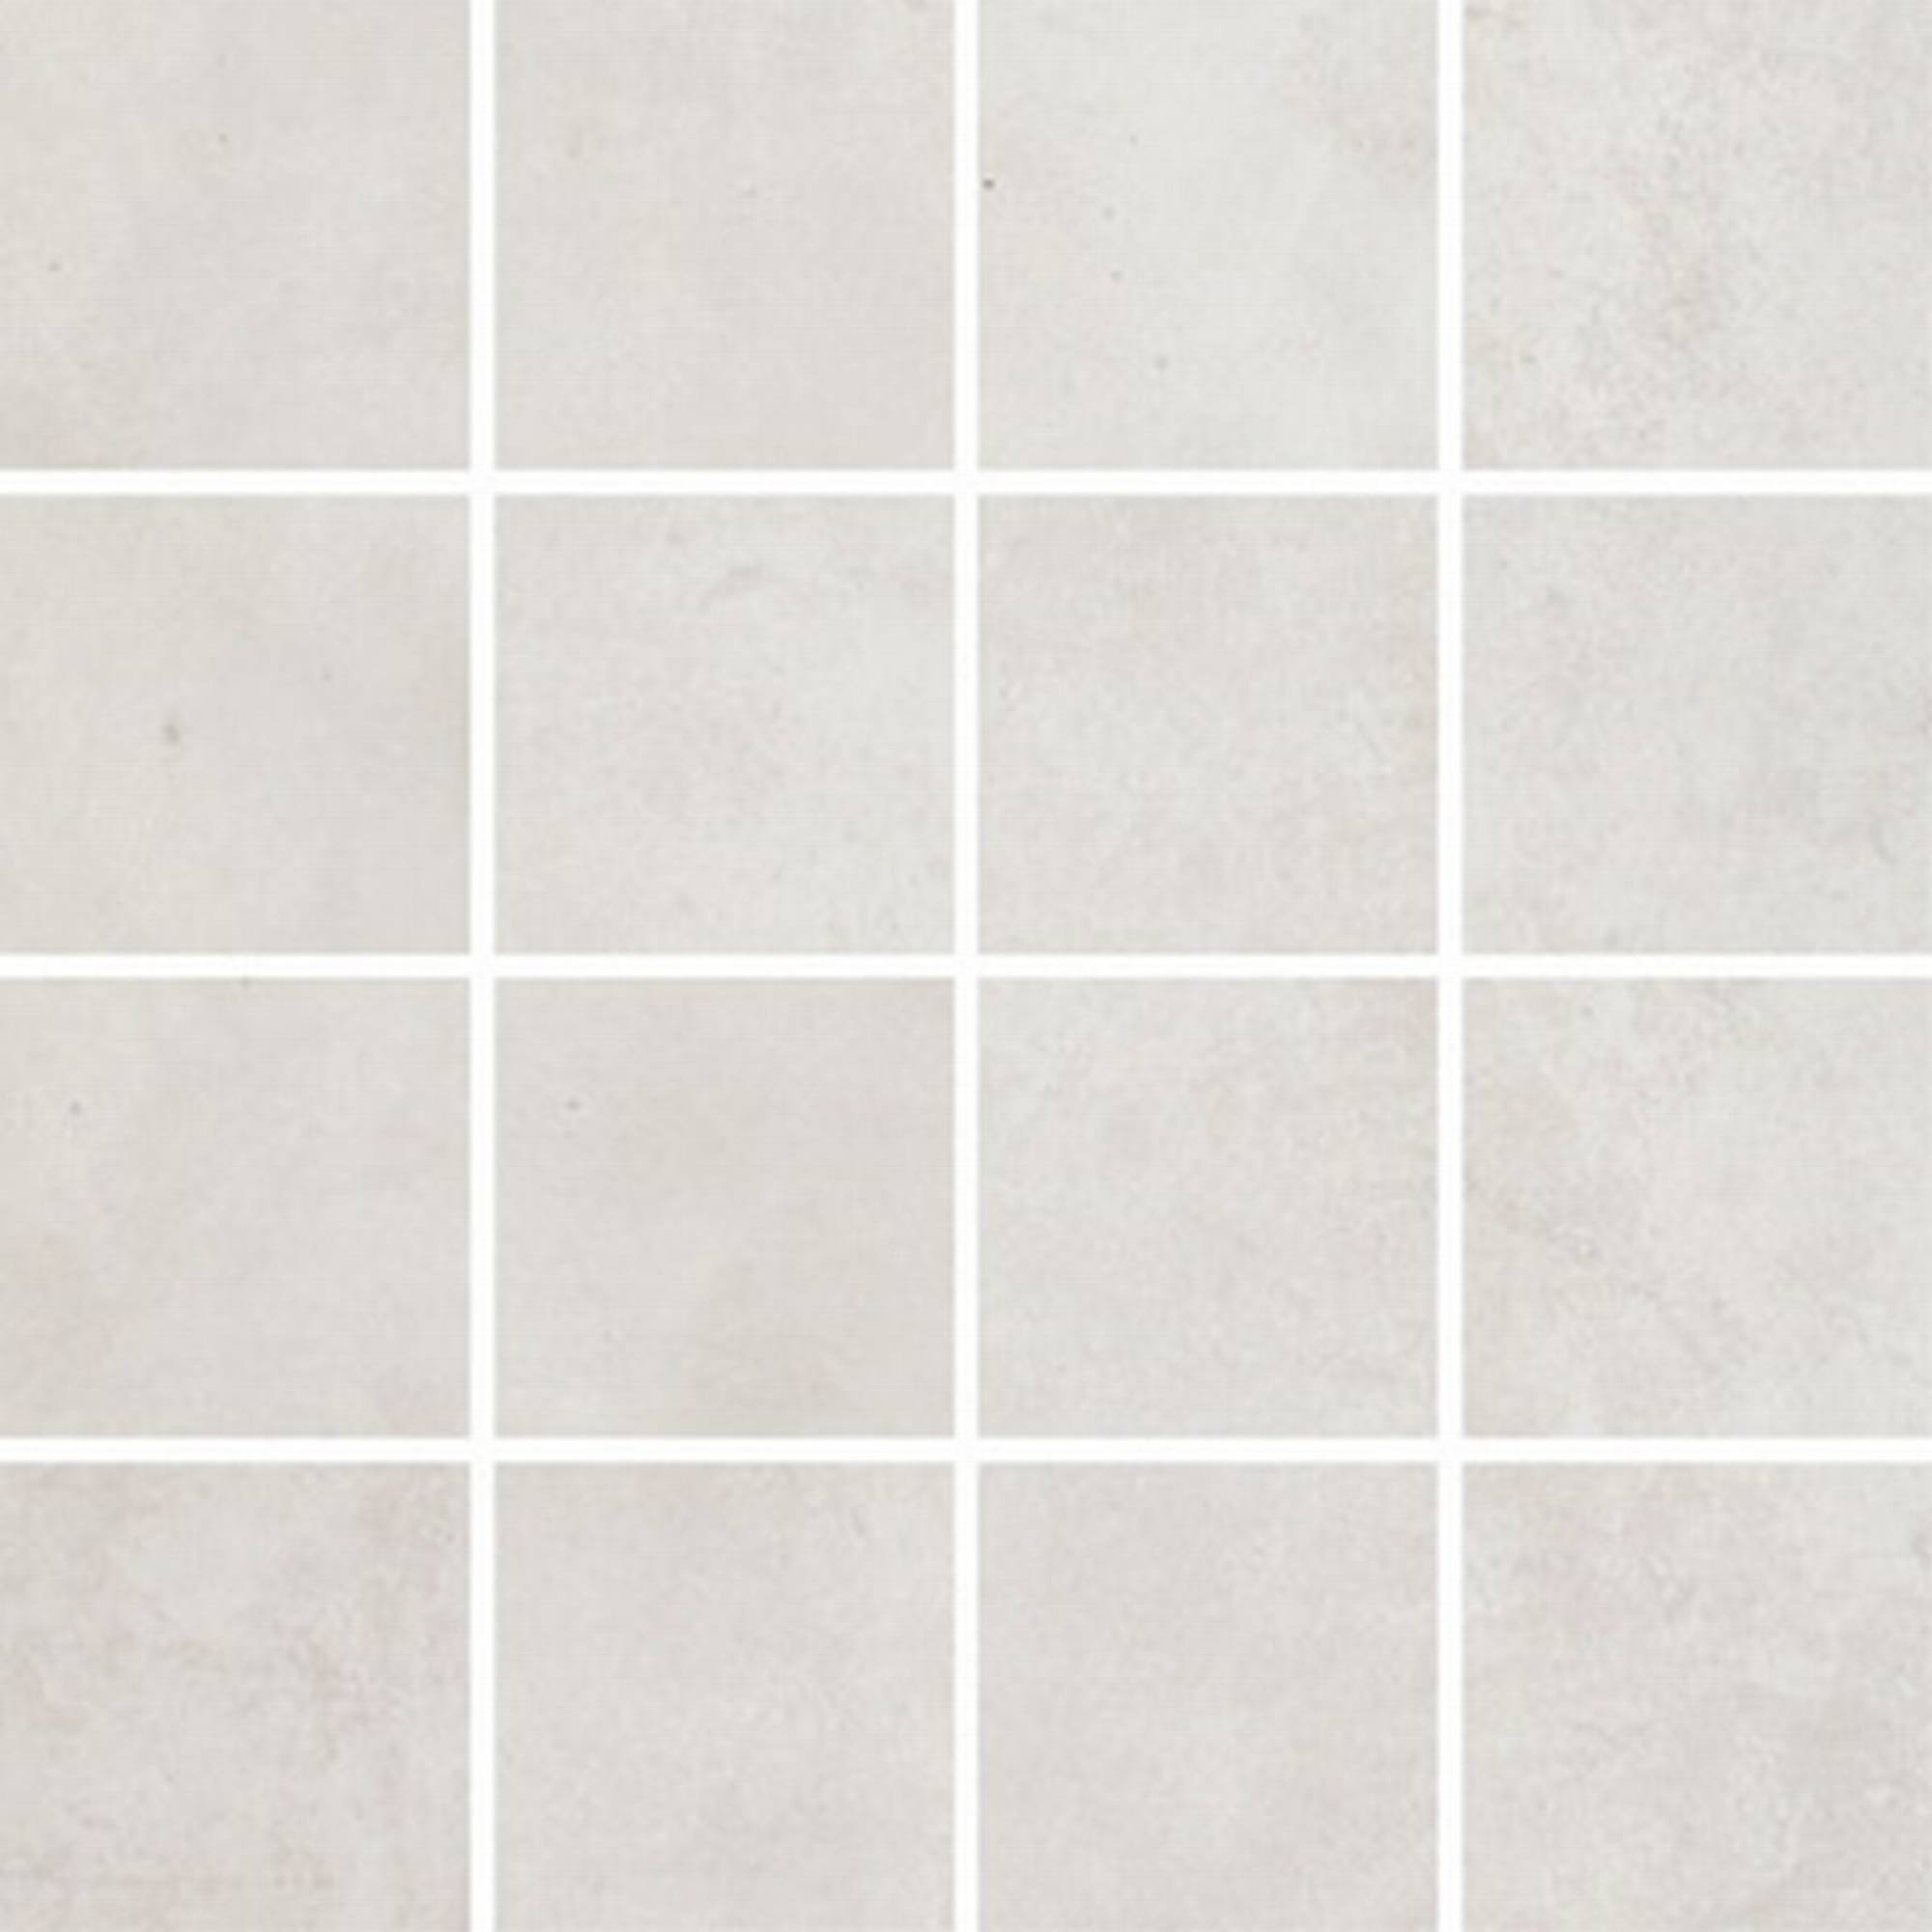 Villeroy & boch Warehouse tegelmat 30 x 30 cm. blok 7,5 x 7,5 cm. a 11 stuks, wit-grijs